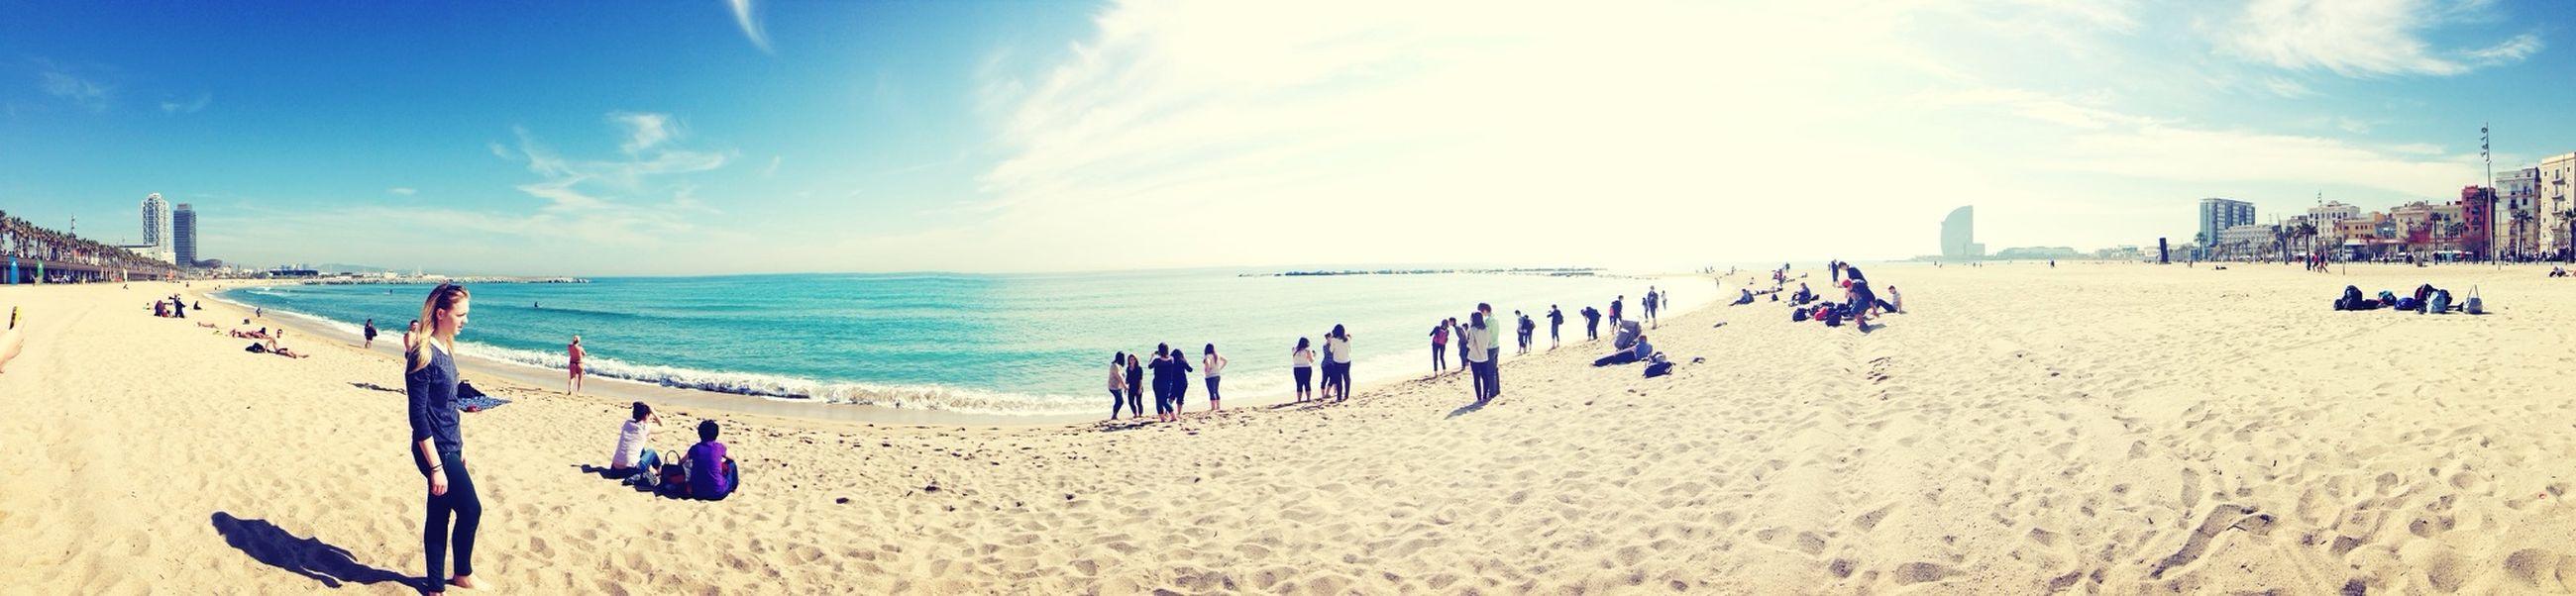 Playa ☀️?